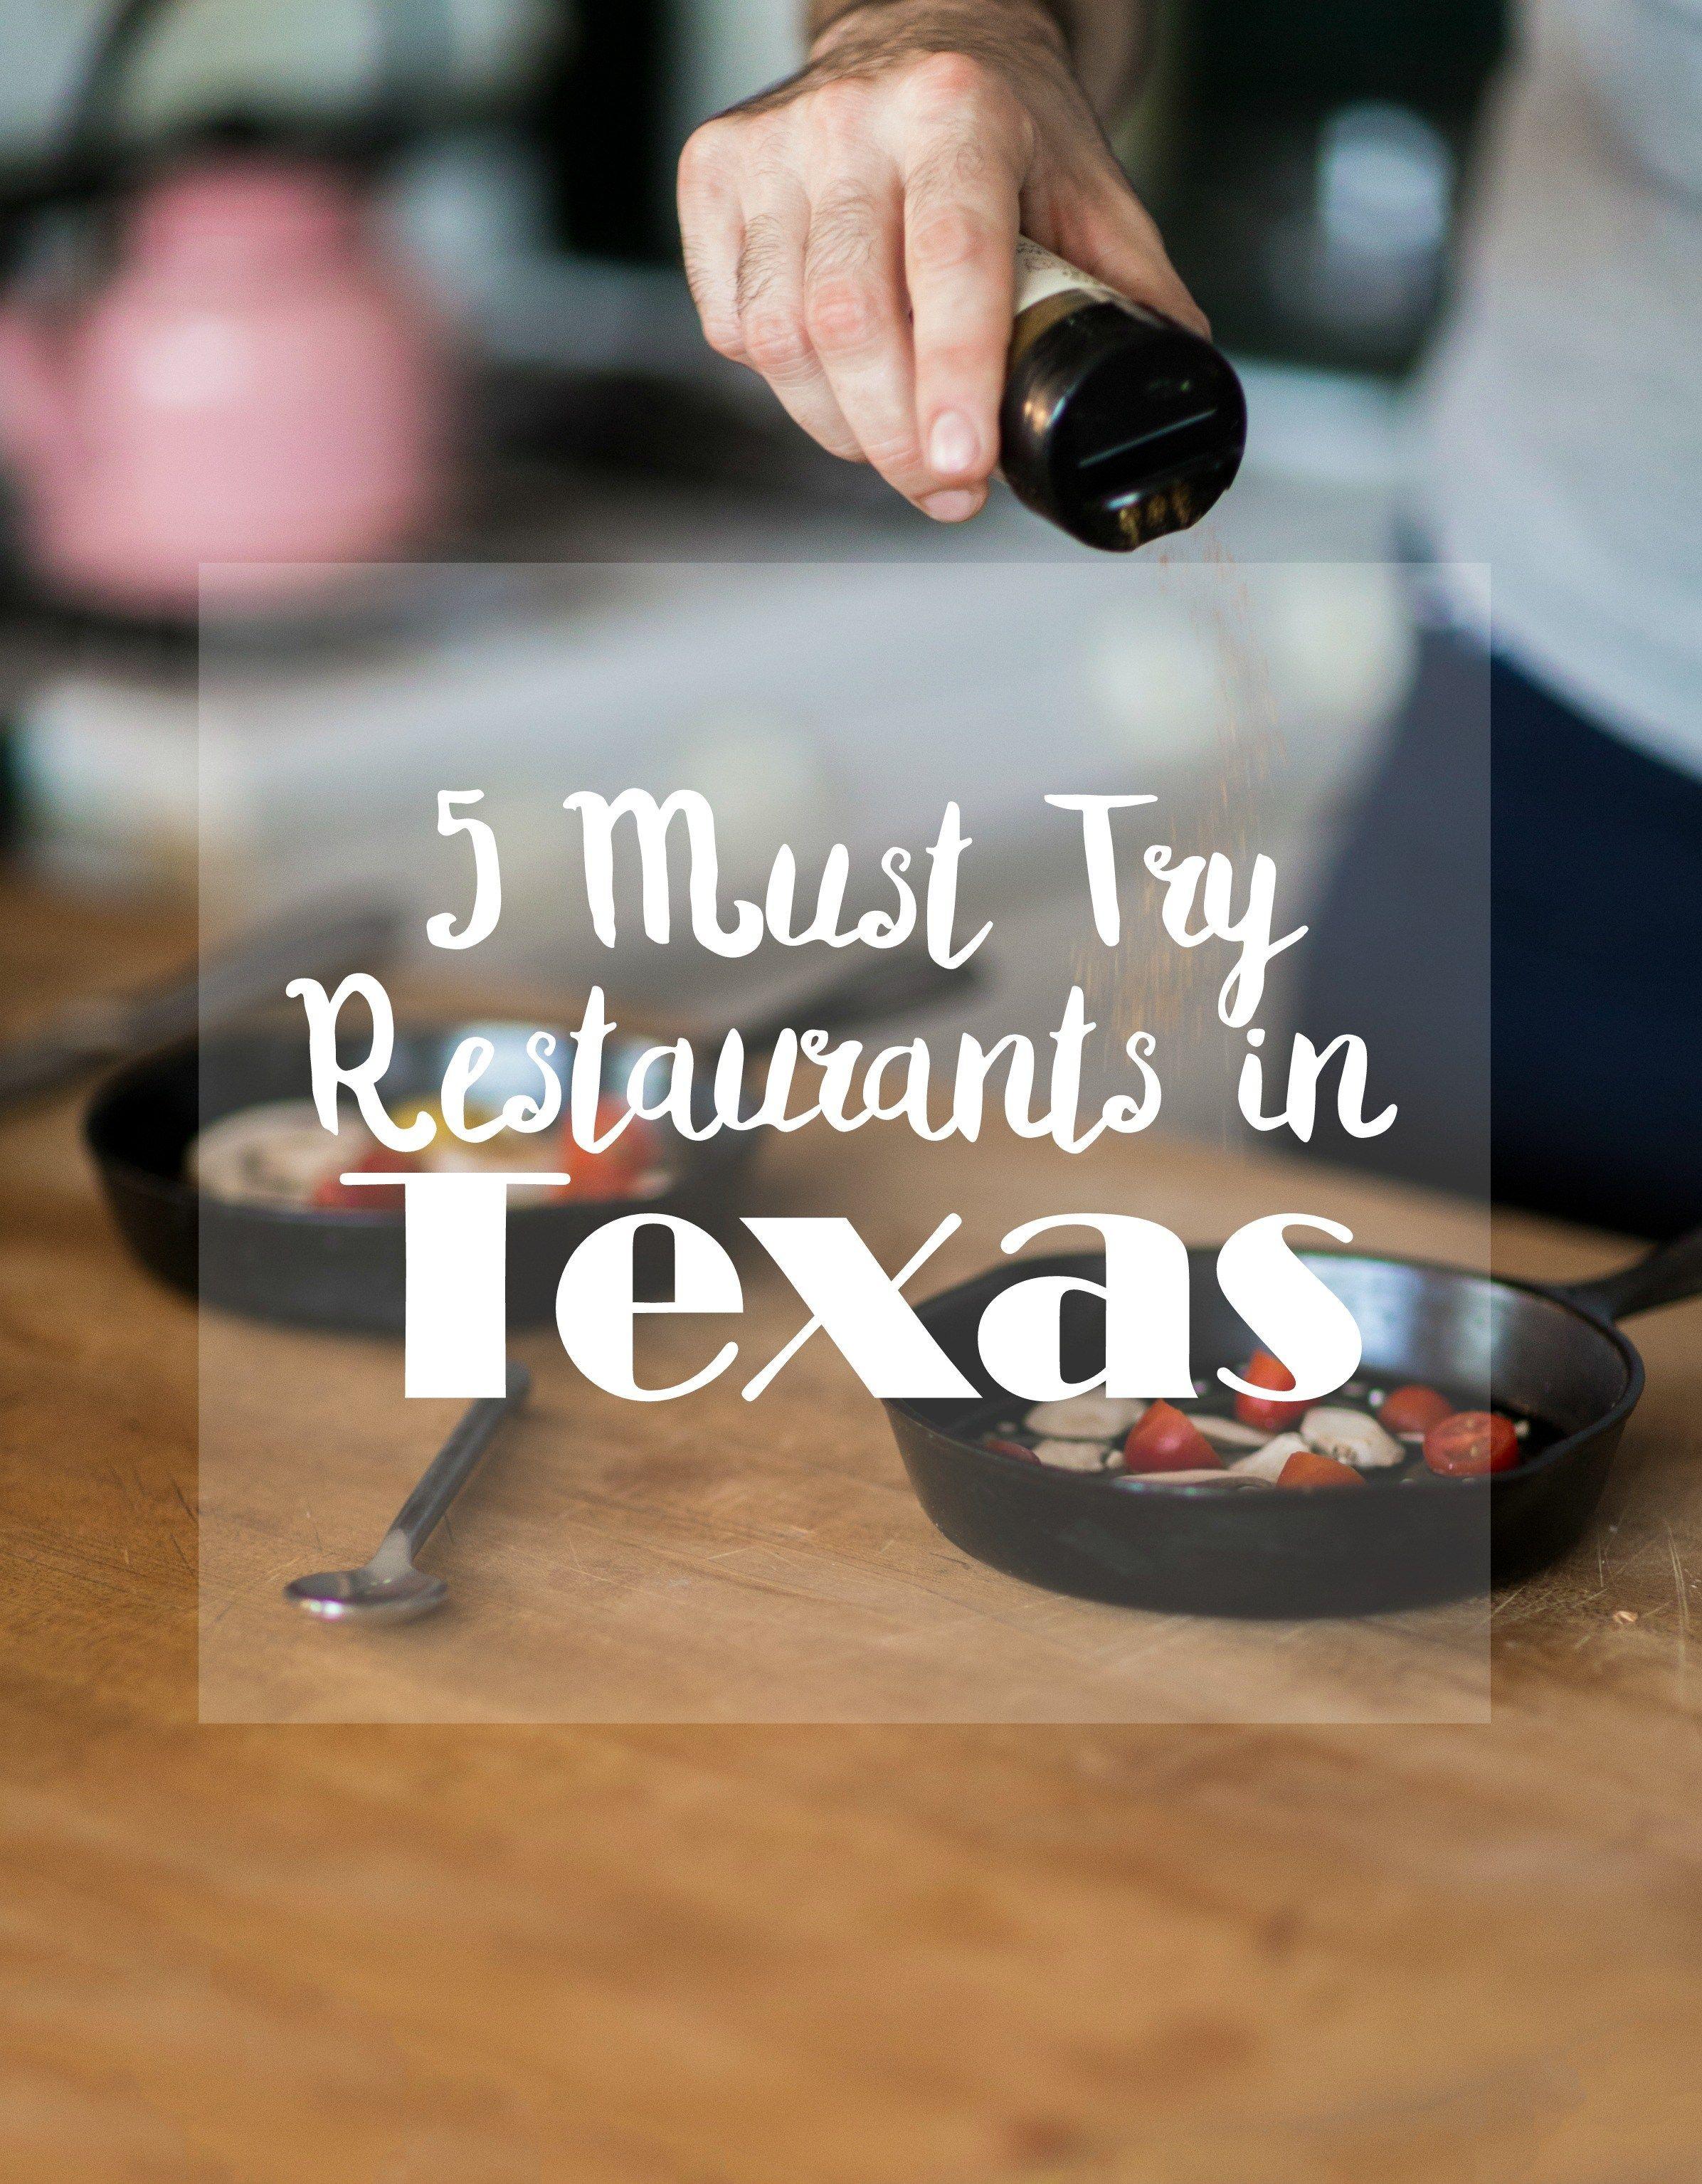 Five must try restaurants in texas foodie travel texas